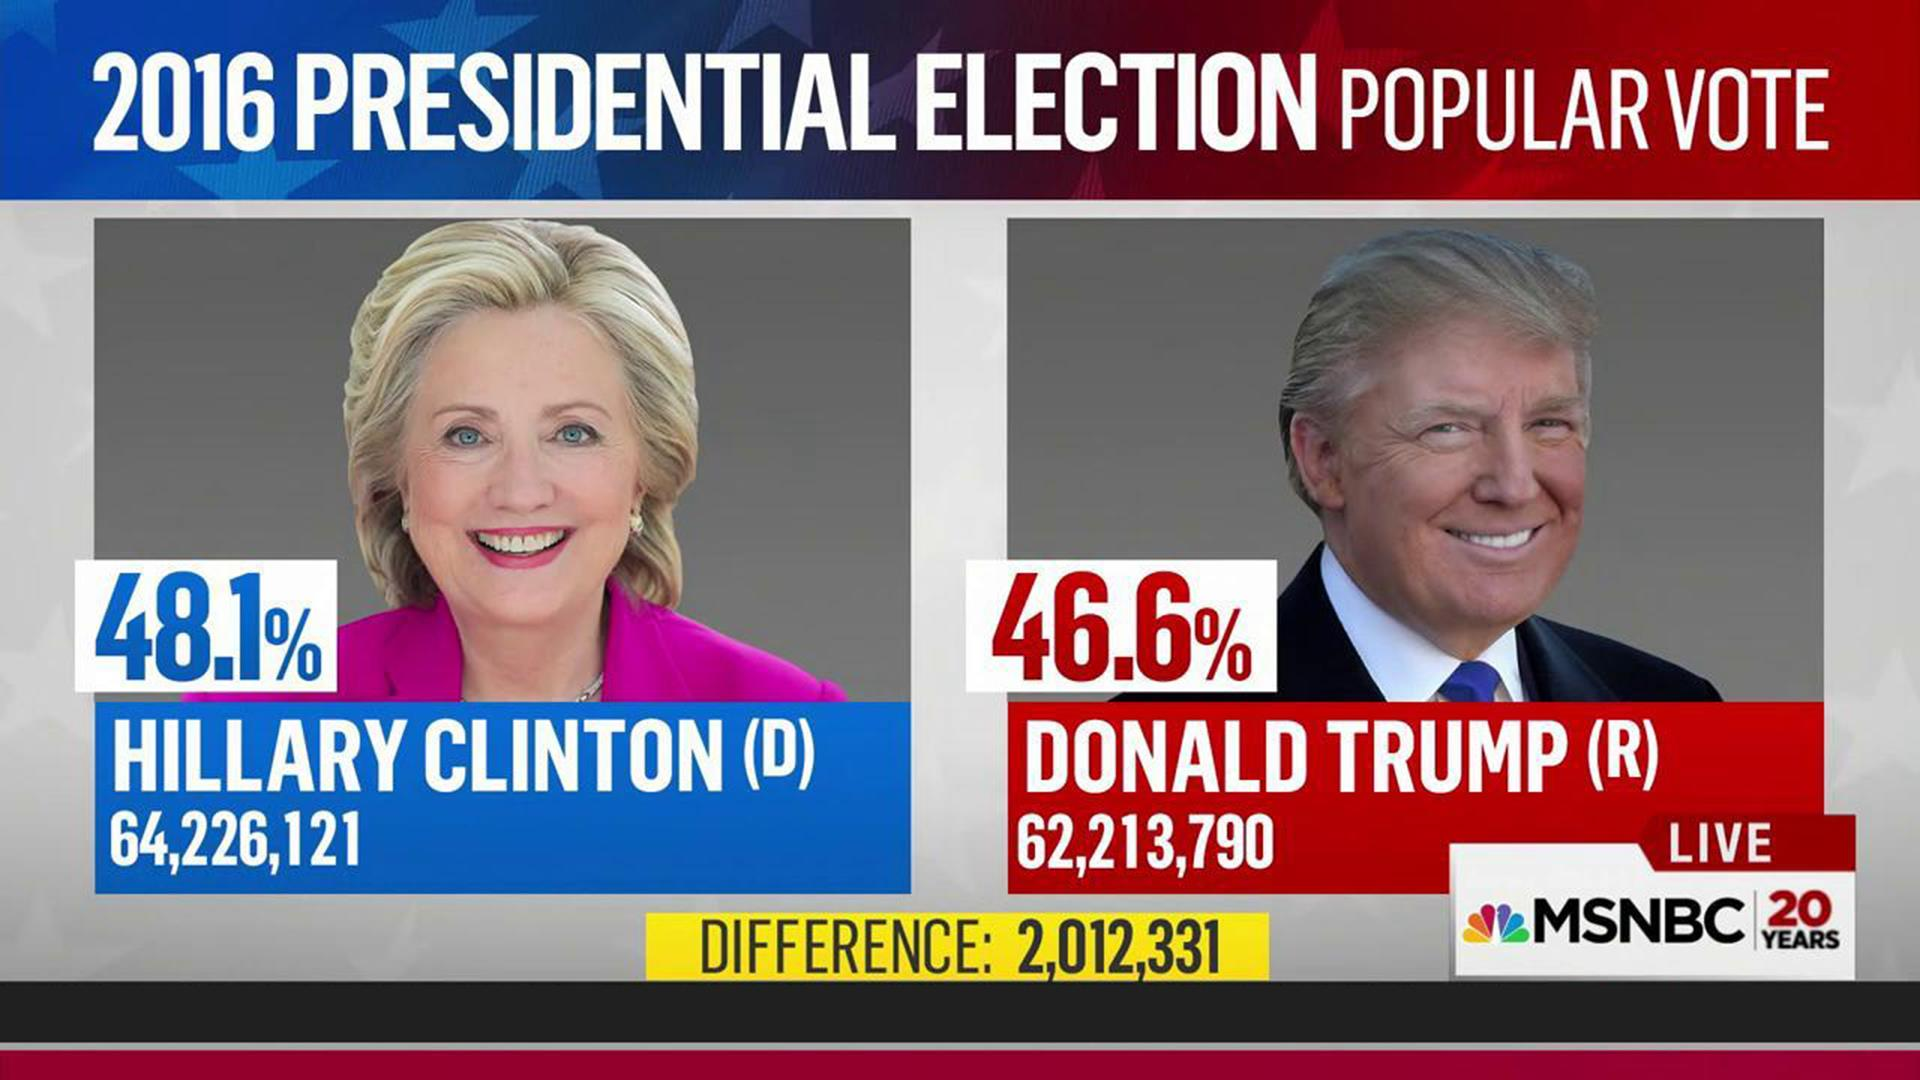 Long Reach To Find Precedent For 2016 Popular Vote Gap In